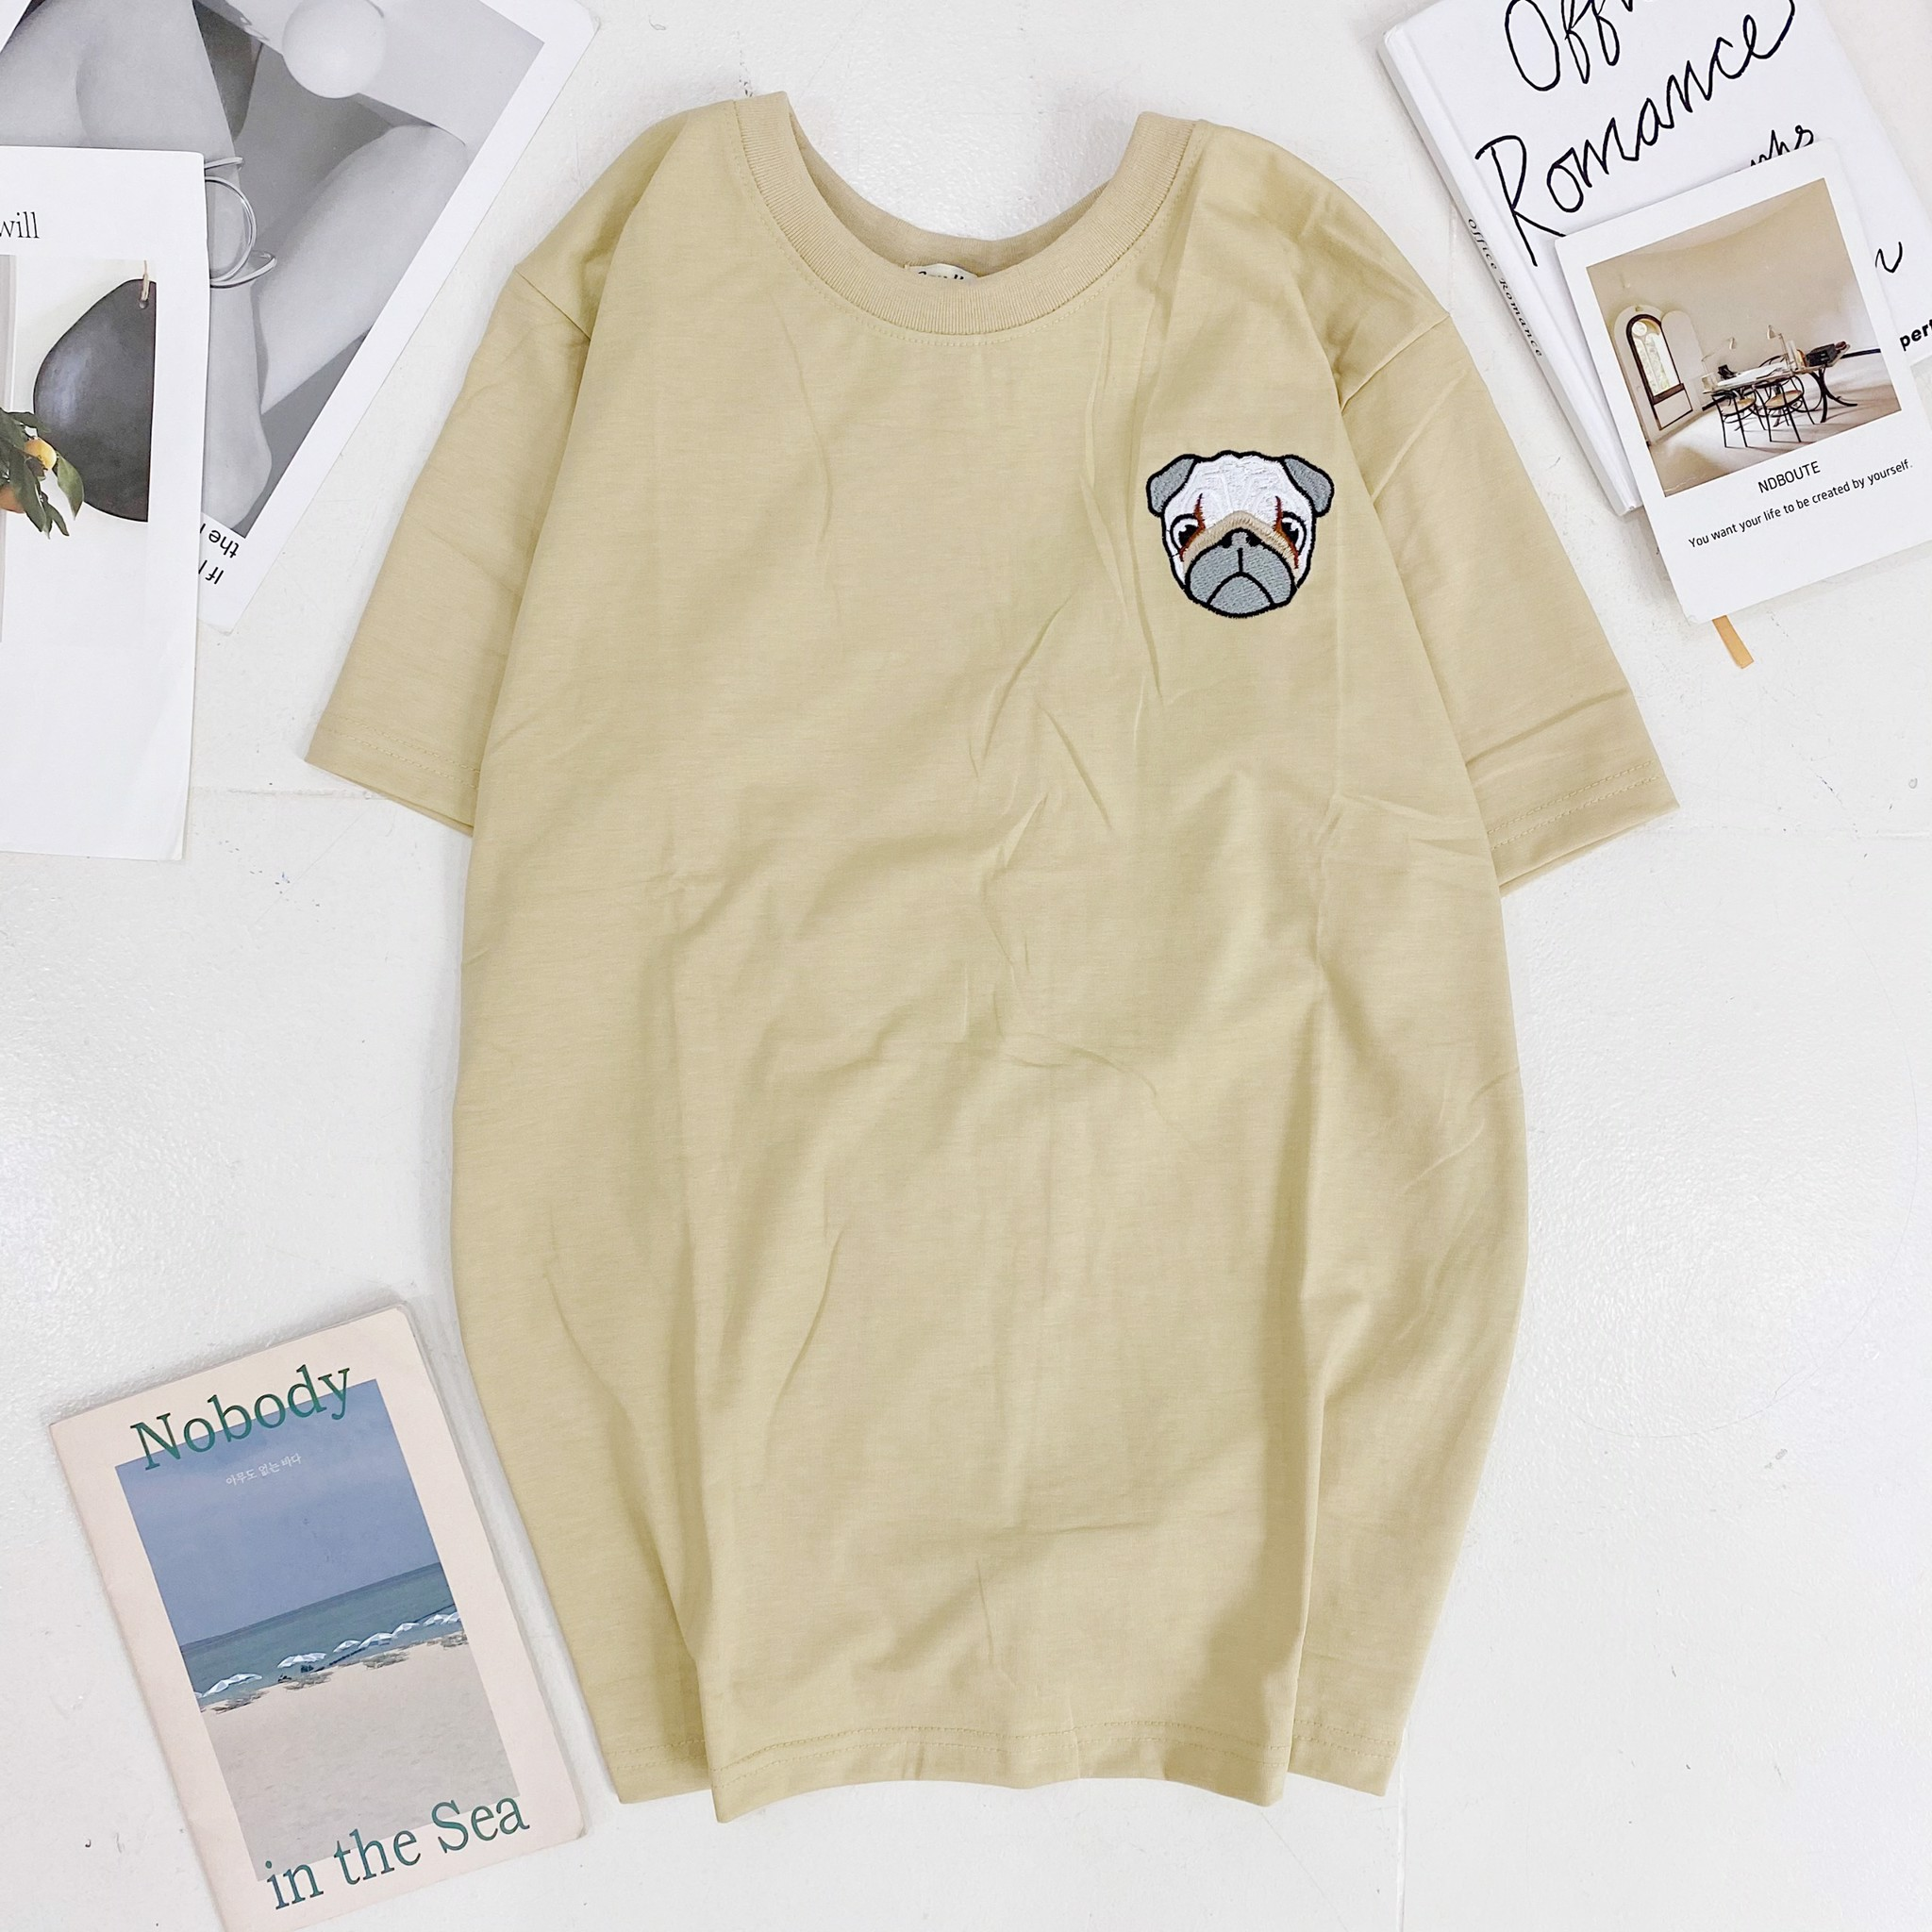 Say Happy Tshirt - Áo thun nude form medium thêu